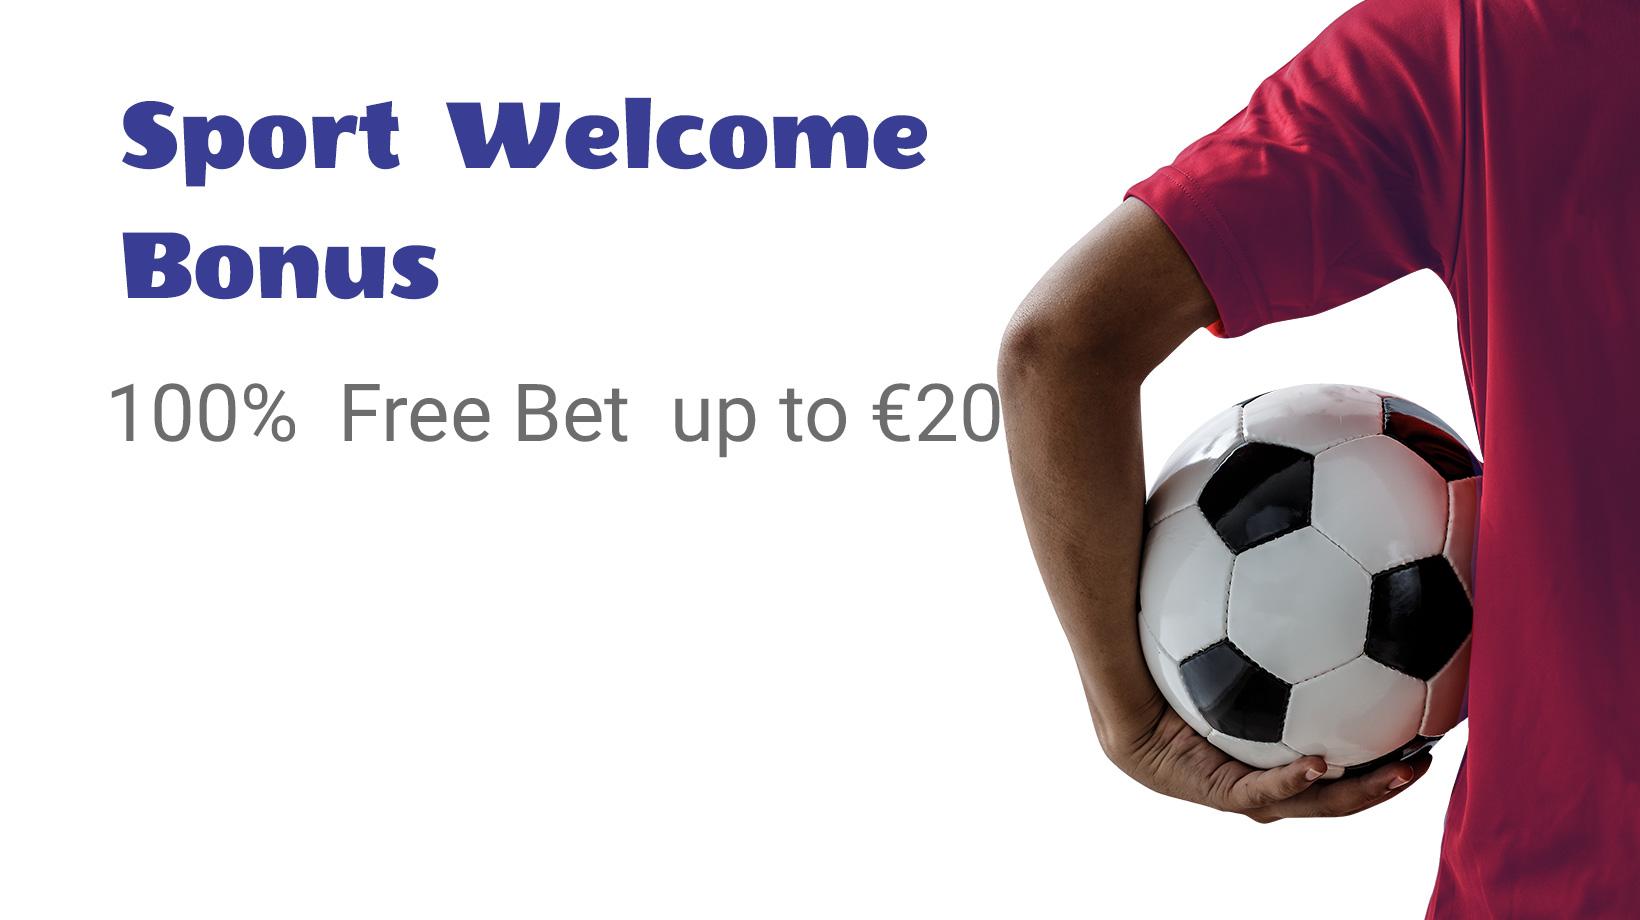 Sport Welcome Bonus 100% Free bet up to €20